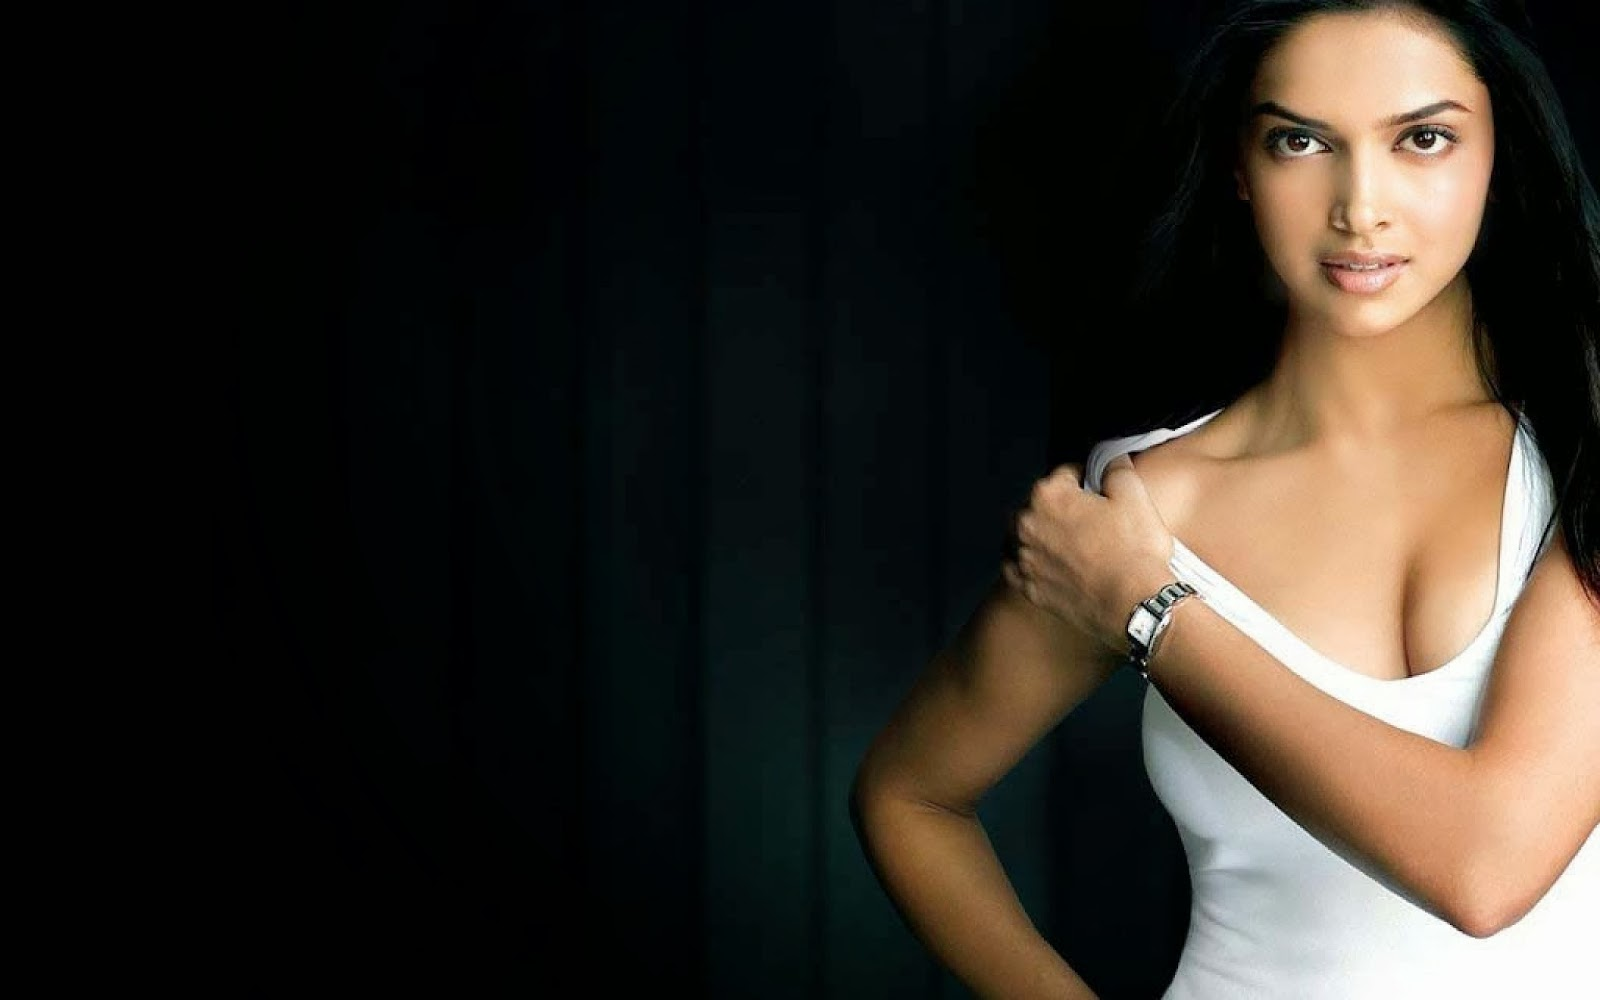 Deepika Padukone Wallpapers: Long Legs Actress Deepika Padukone